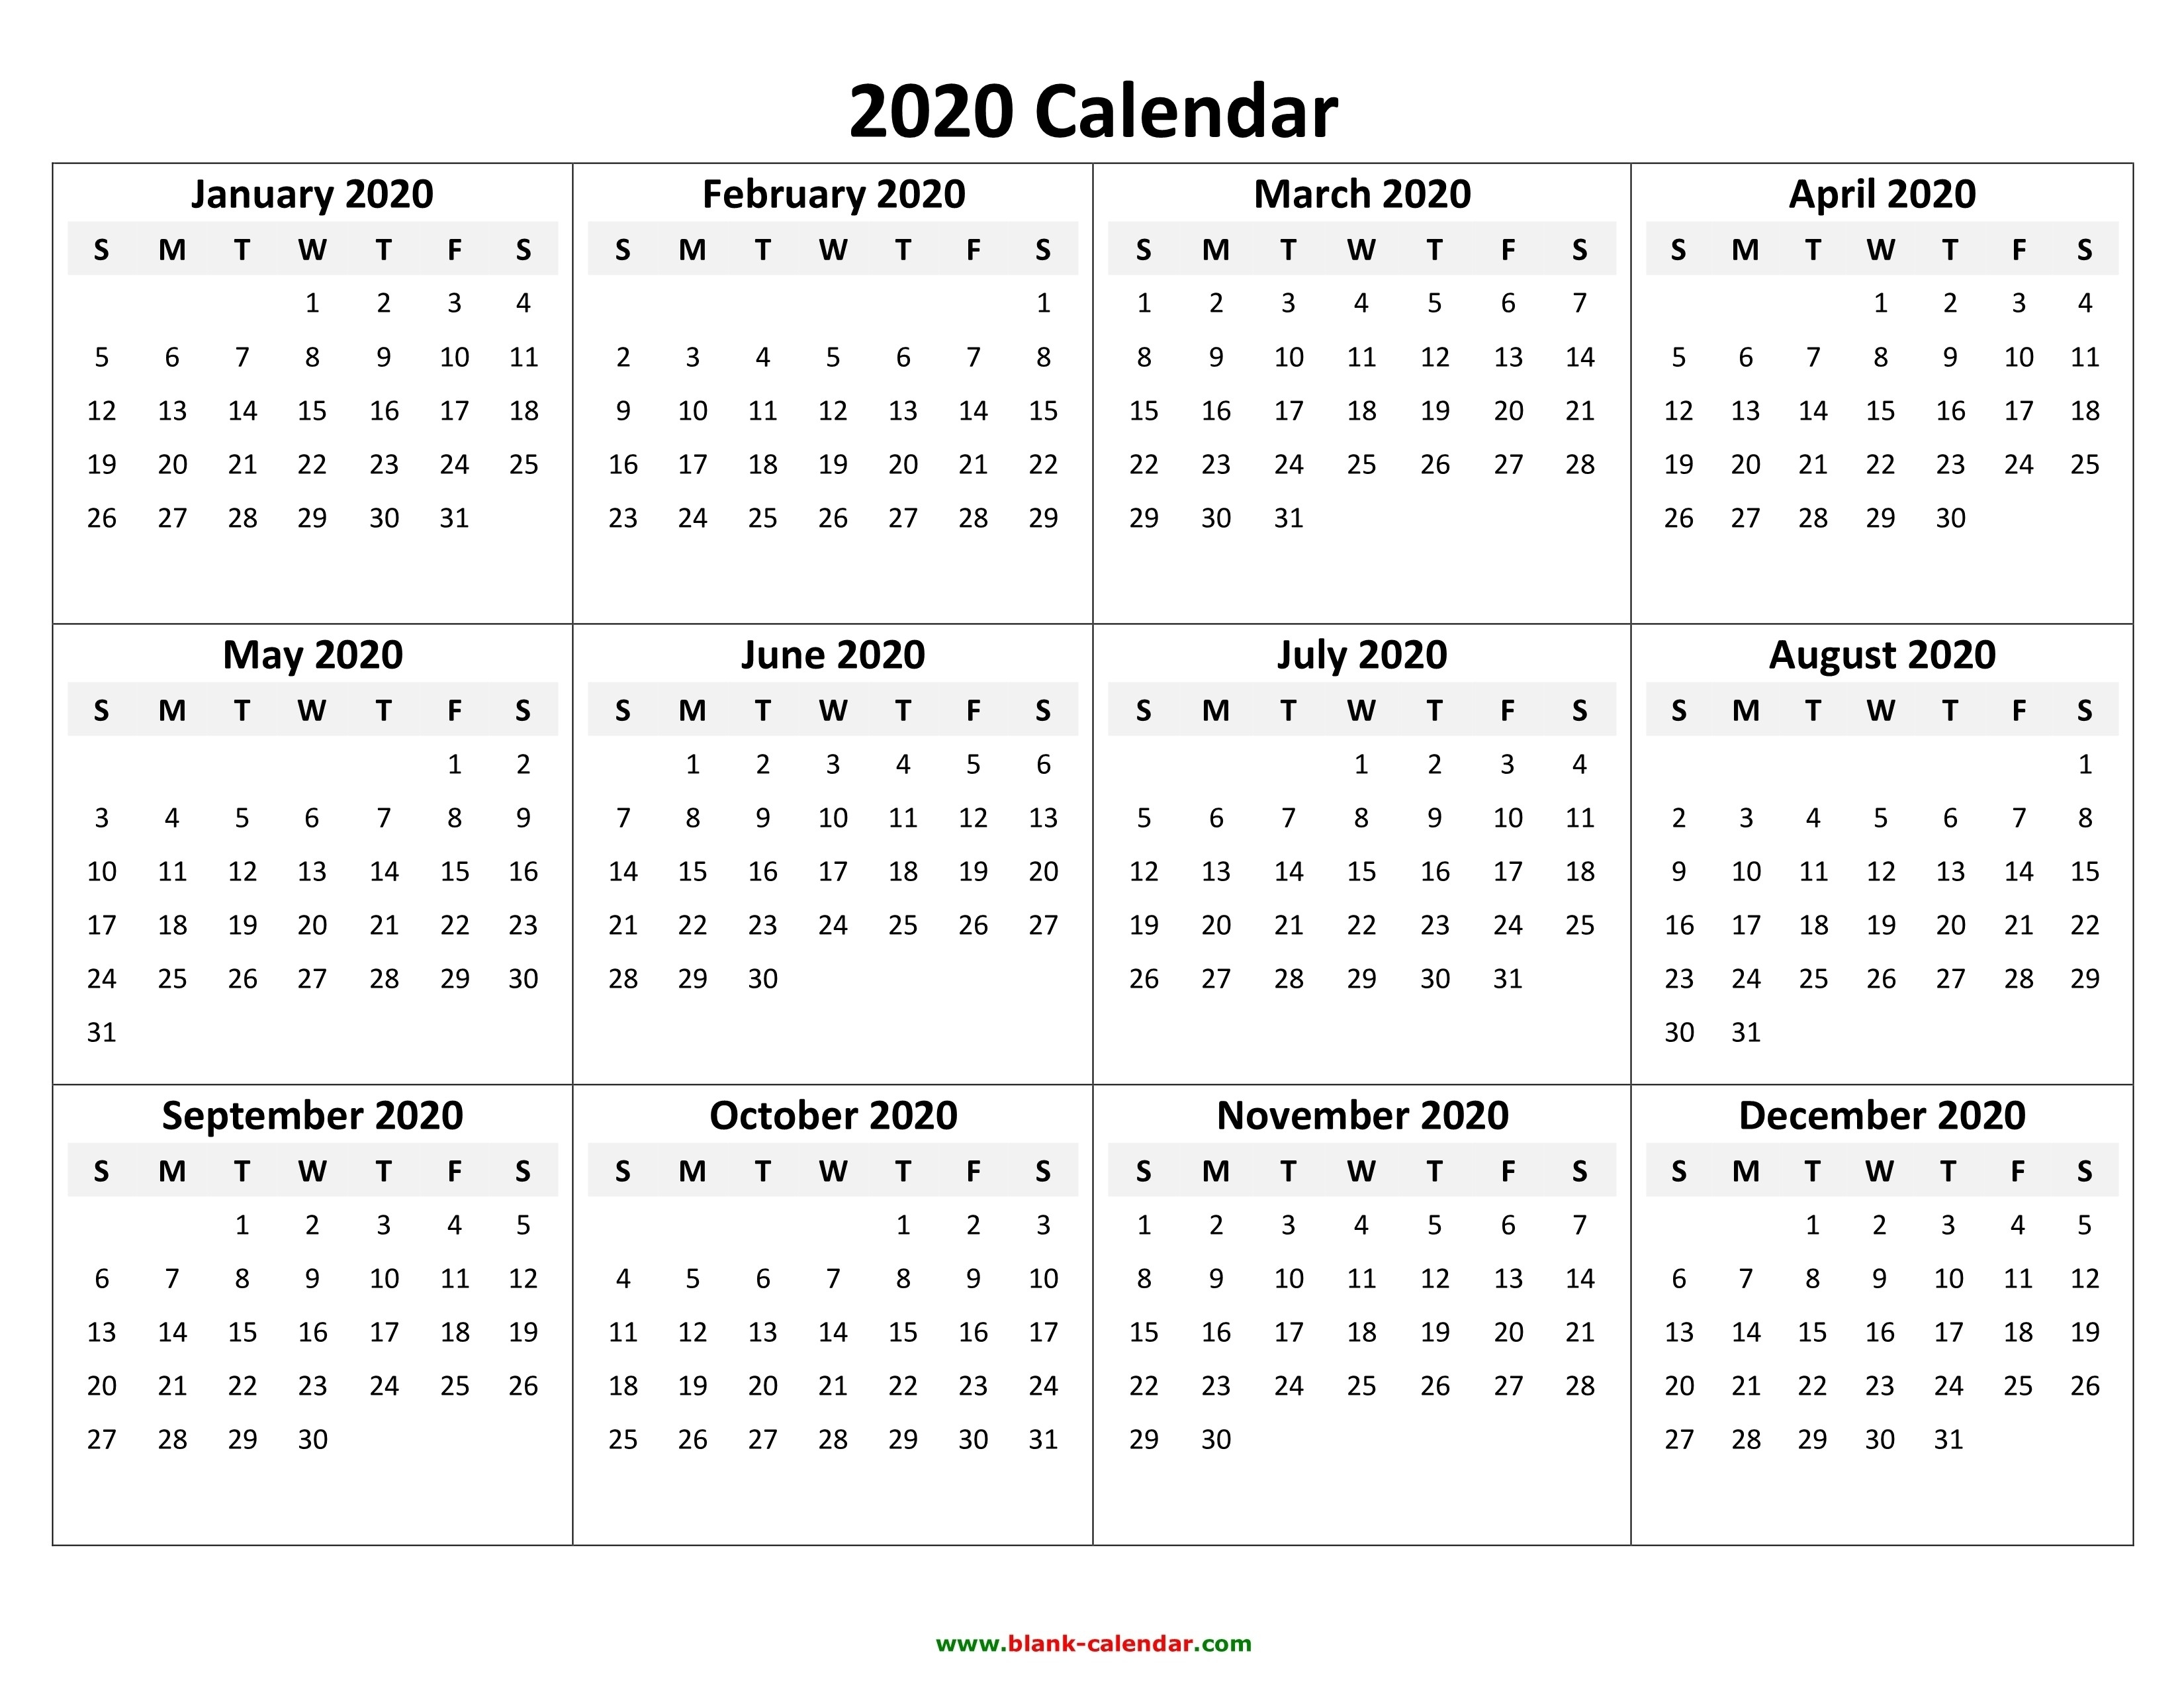 Calendar Template 2020 | One Page Calendar Printable-Fill In Calendar Template 2020